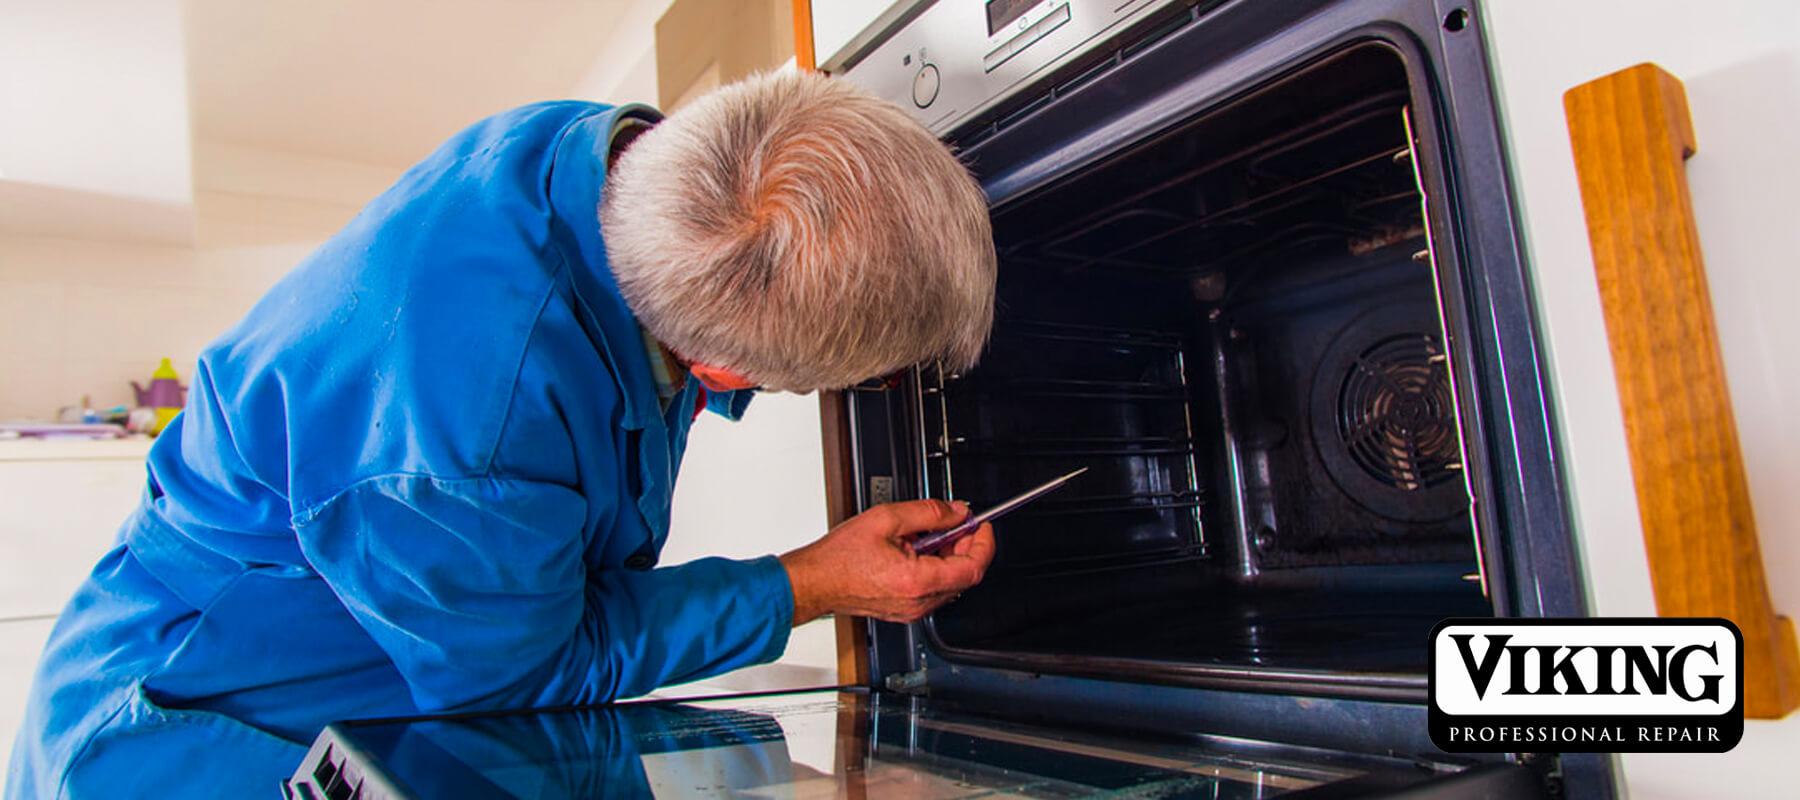 Certified Viking Appliance Repair Palm Springs | Professional Viking Repair